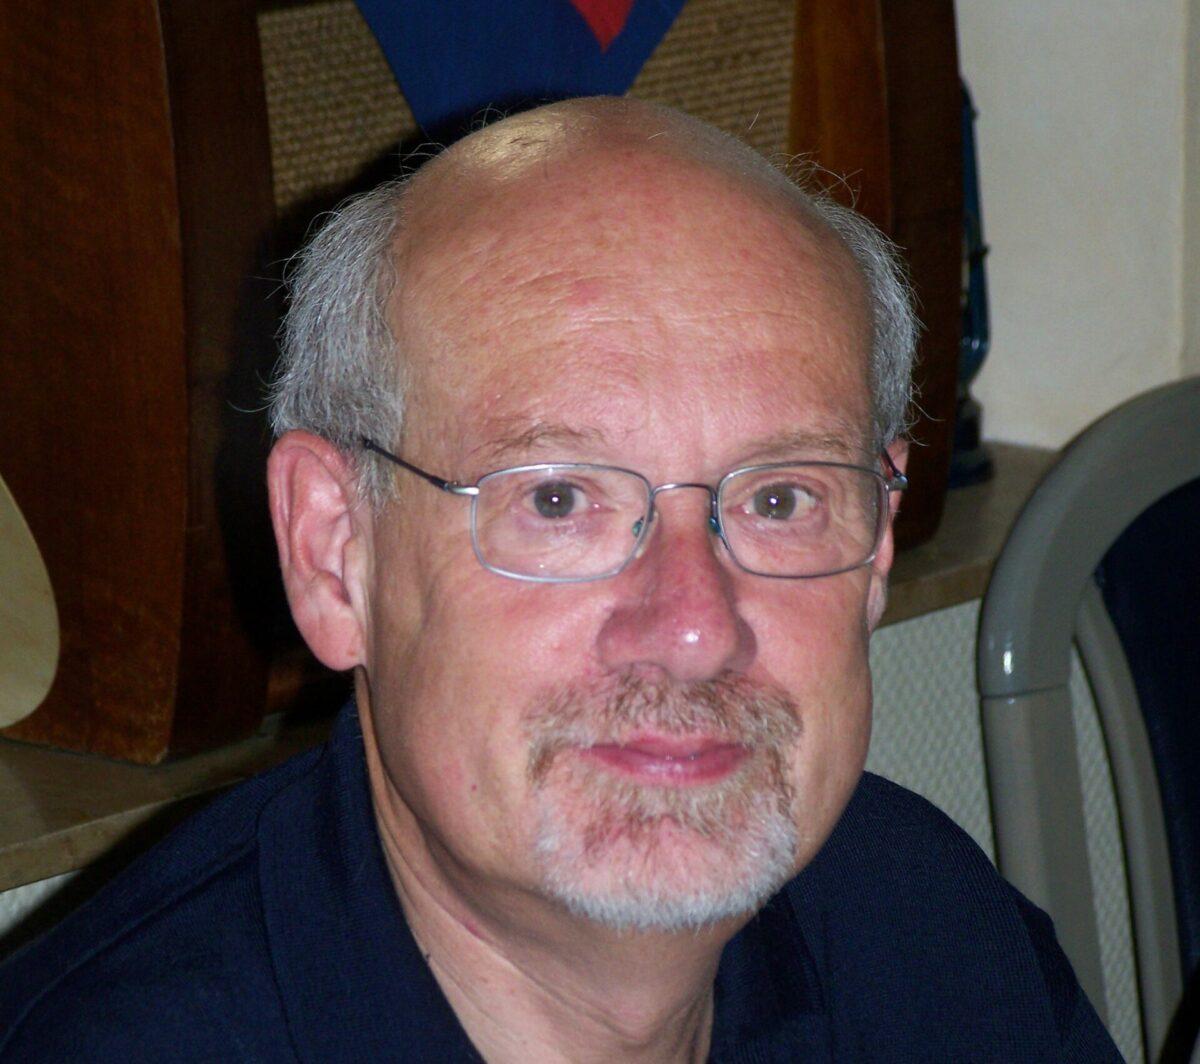 Jürgen Fechner